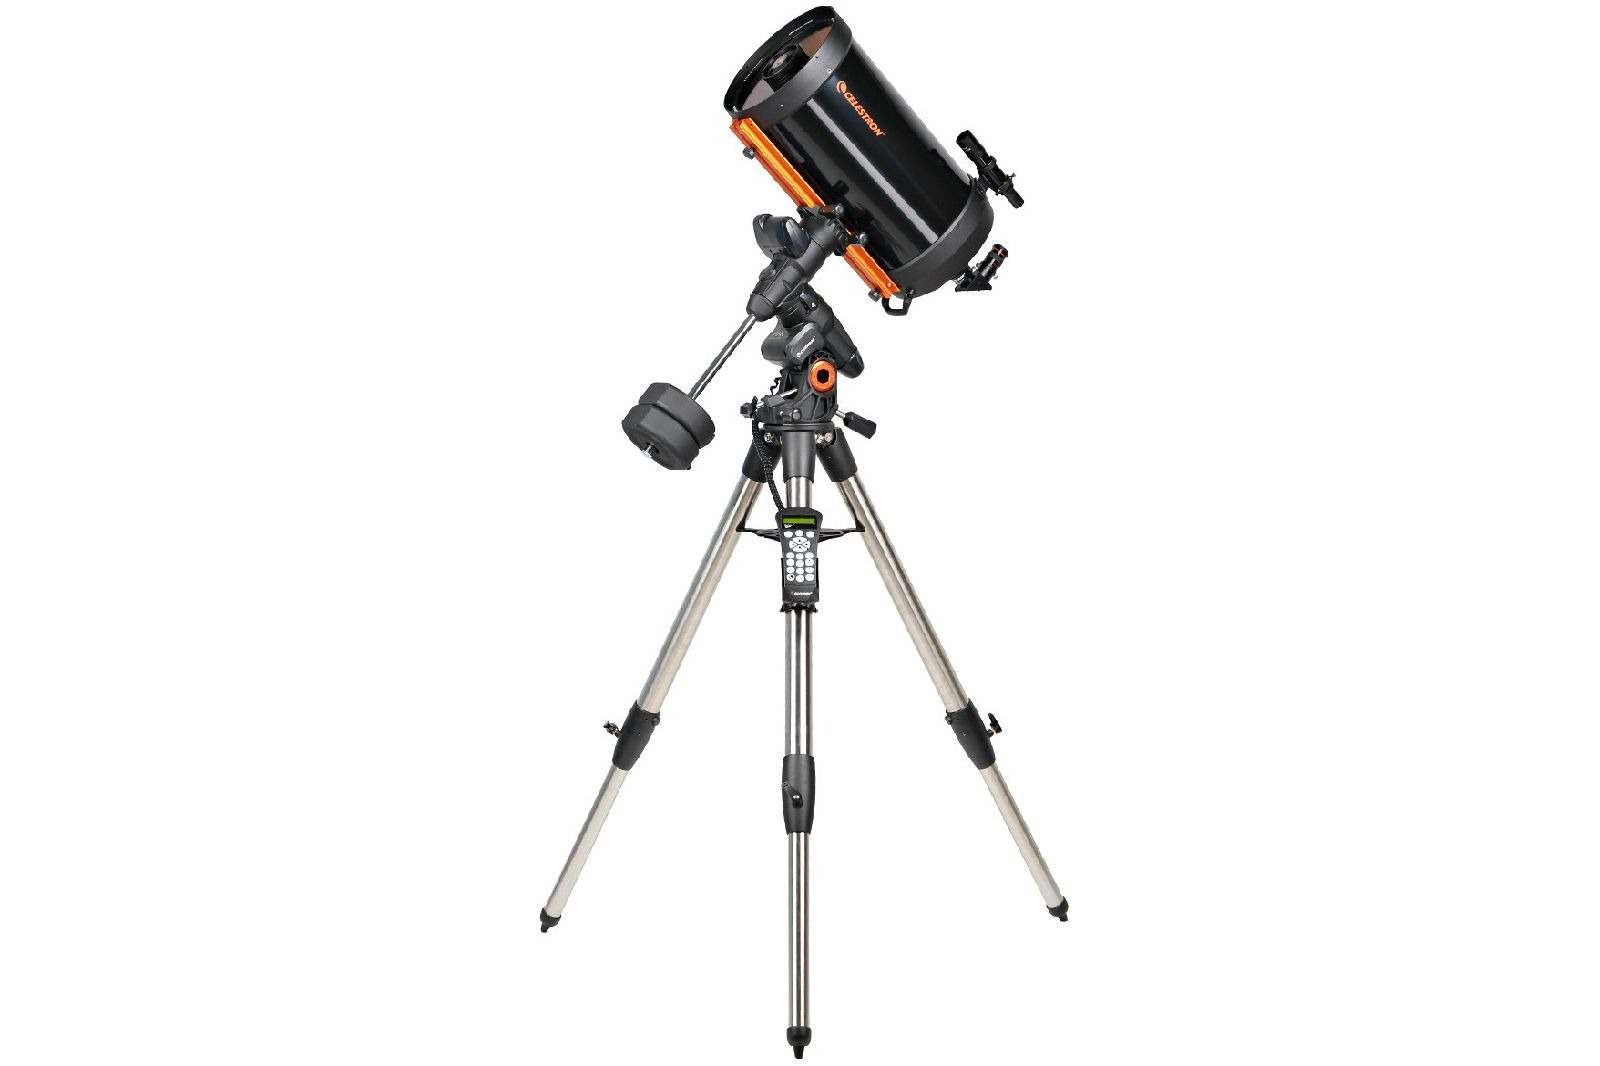 Image of Teleskop celestron advanced vx 8 sct (do.12026)